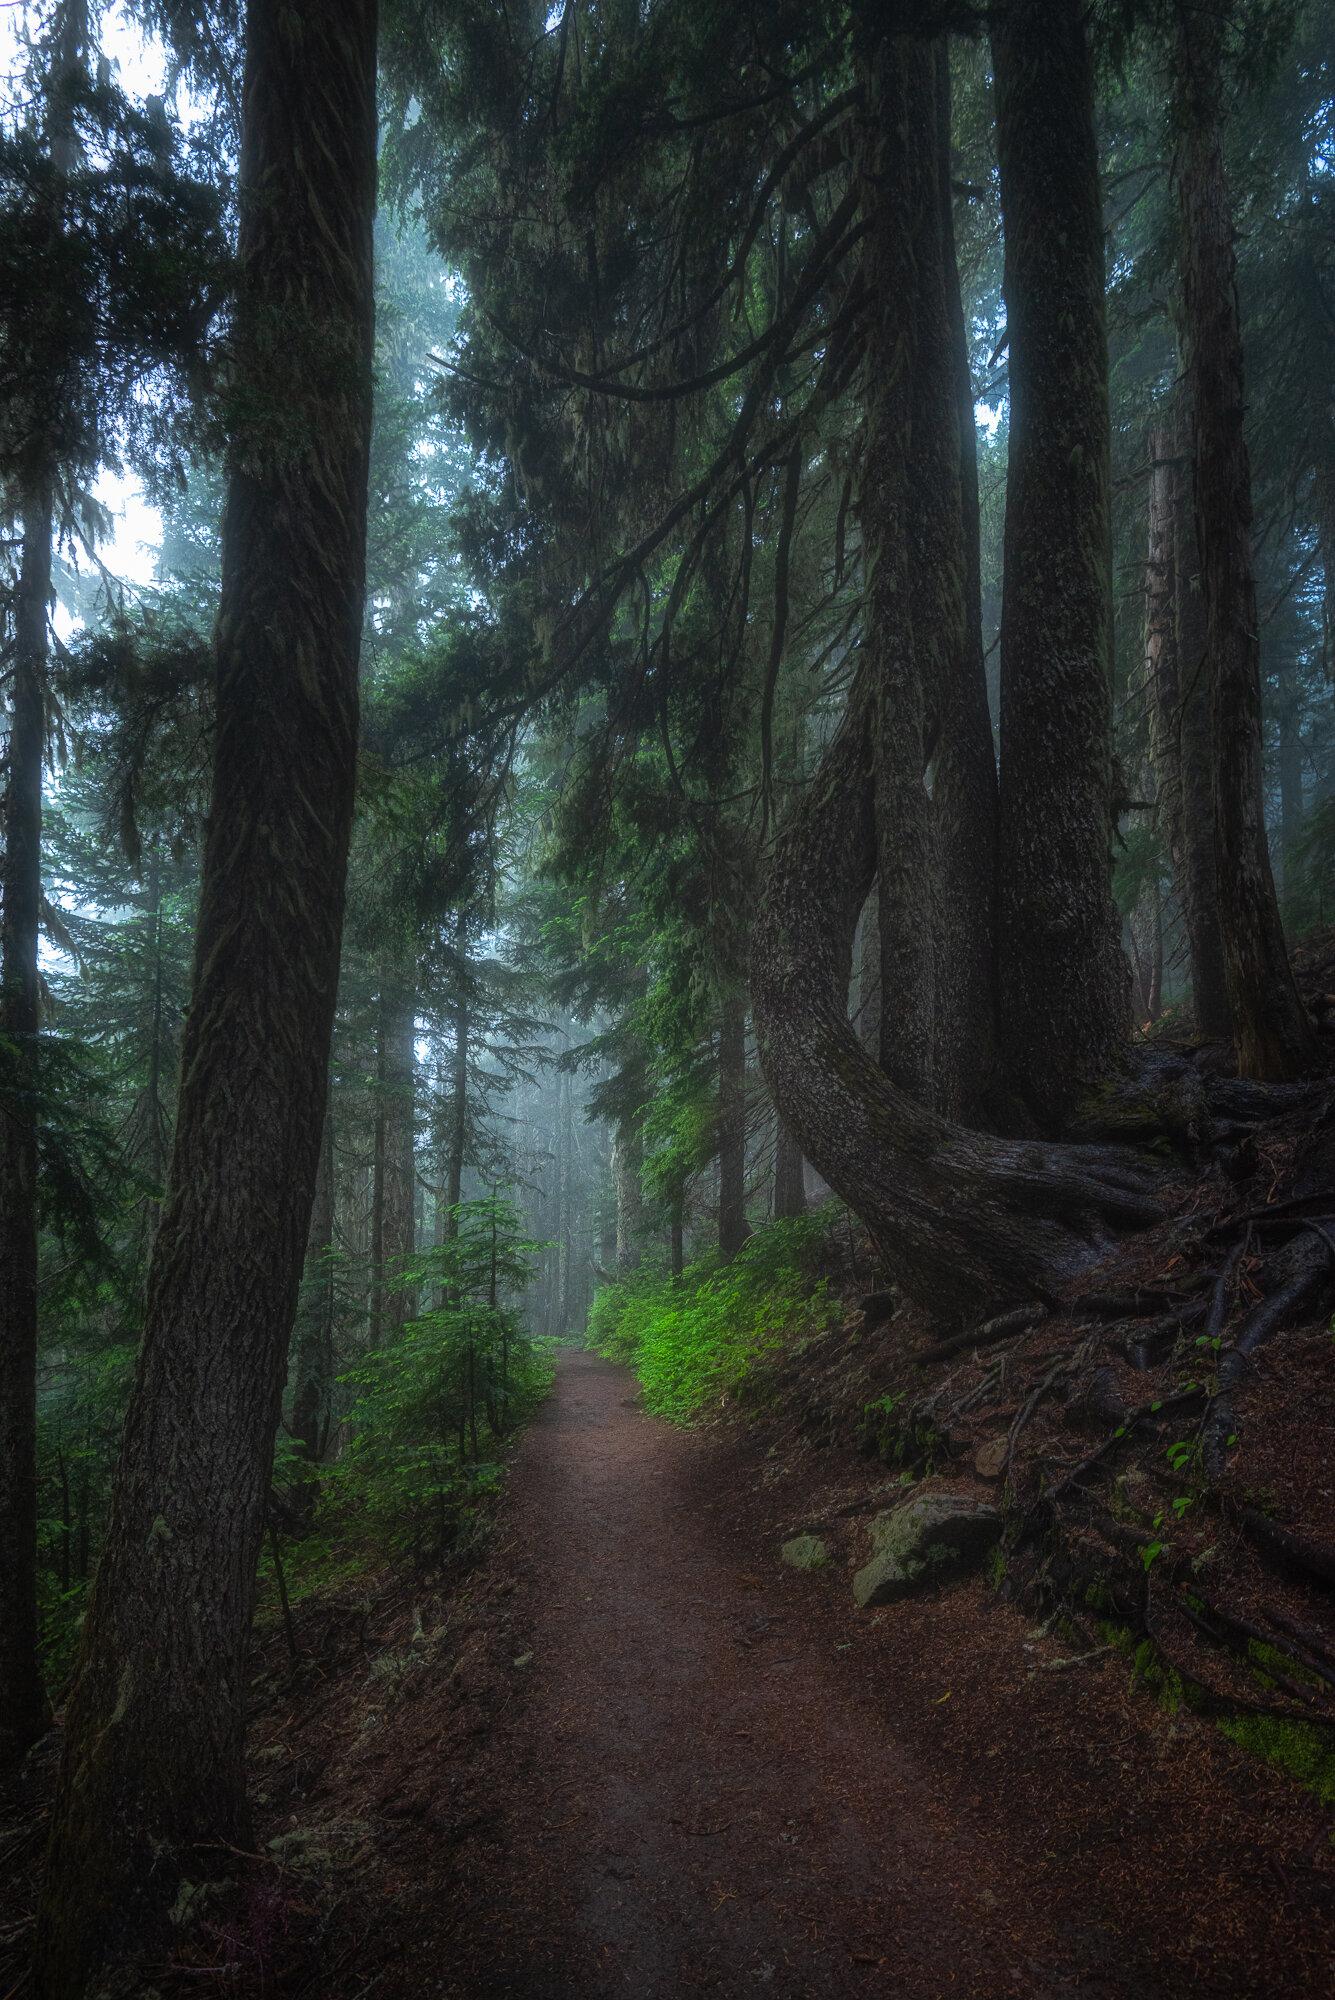 Mount Rainier Photography: 'Path into Fog'